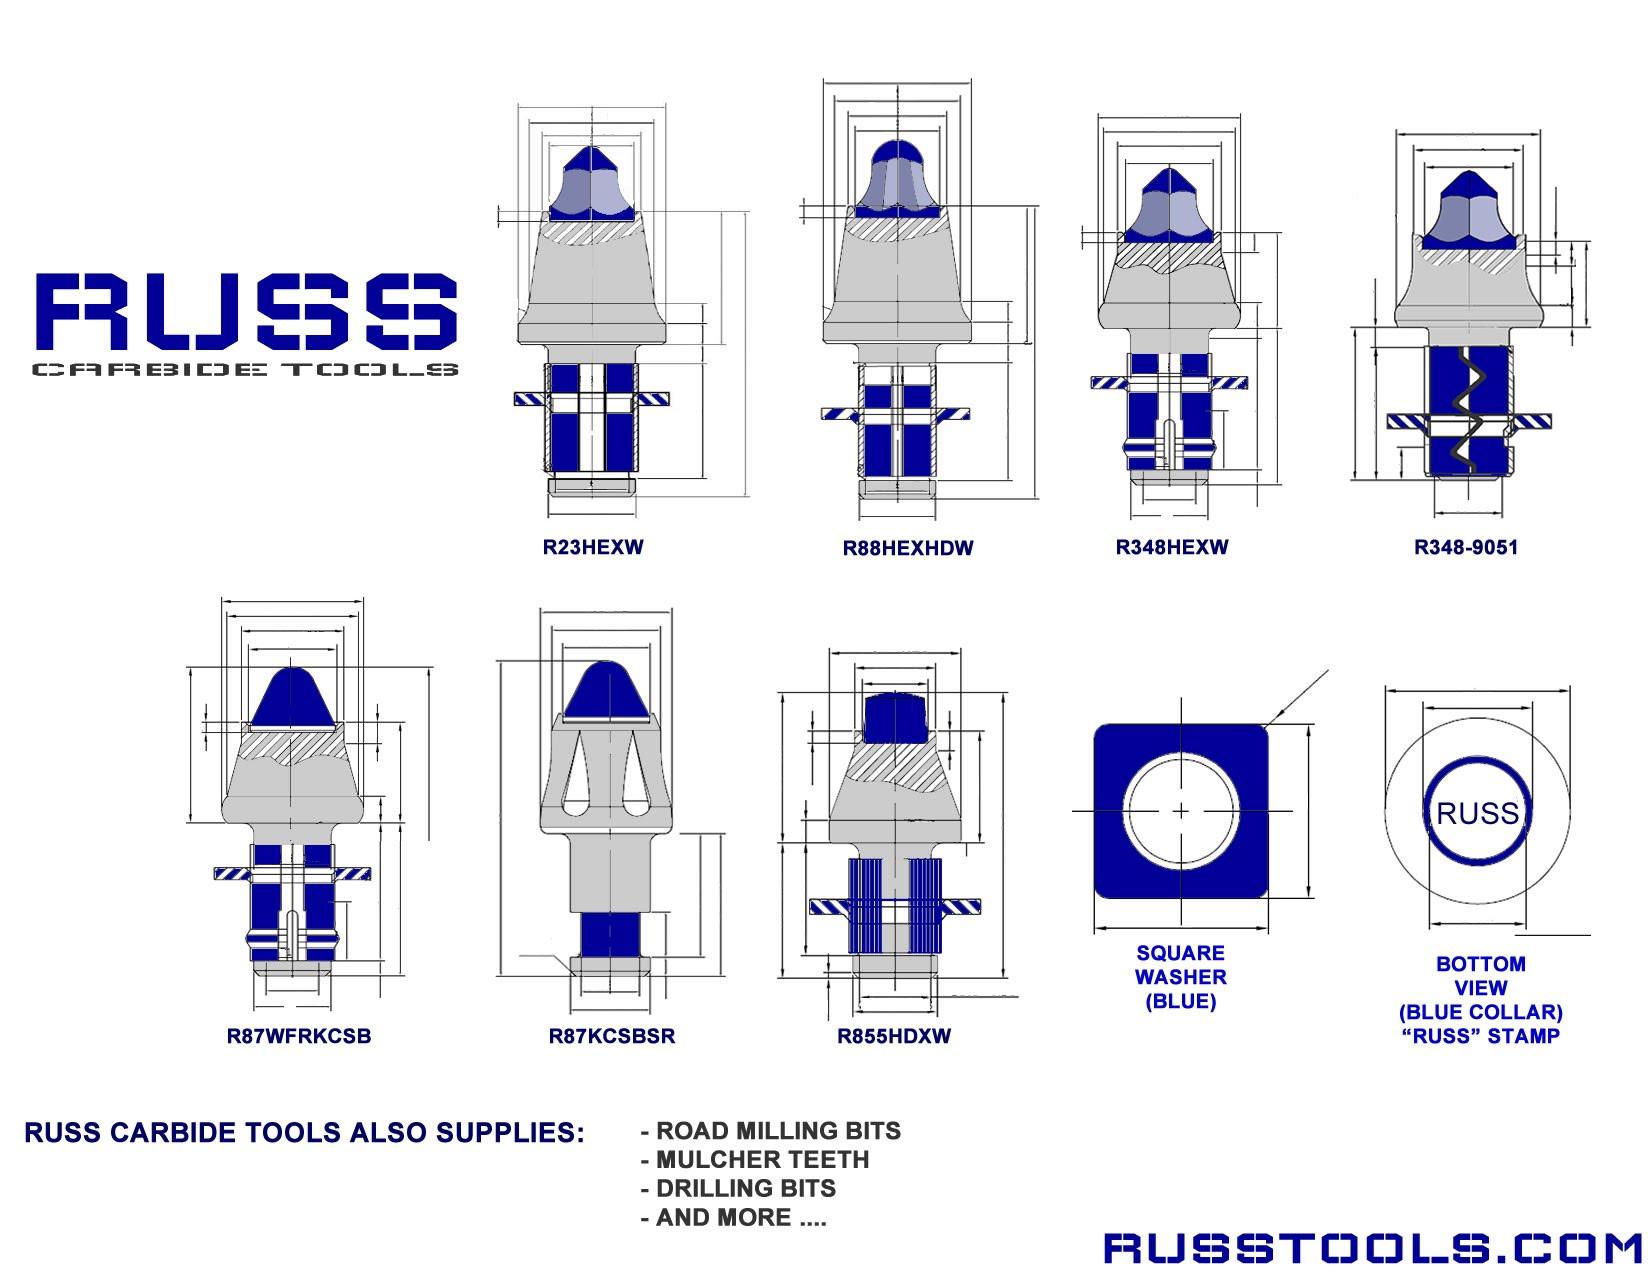 WWW.RUSSTOOLS.COM